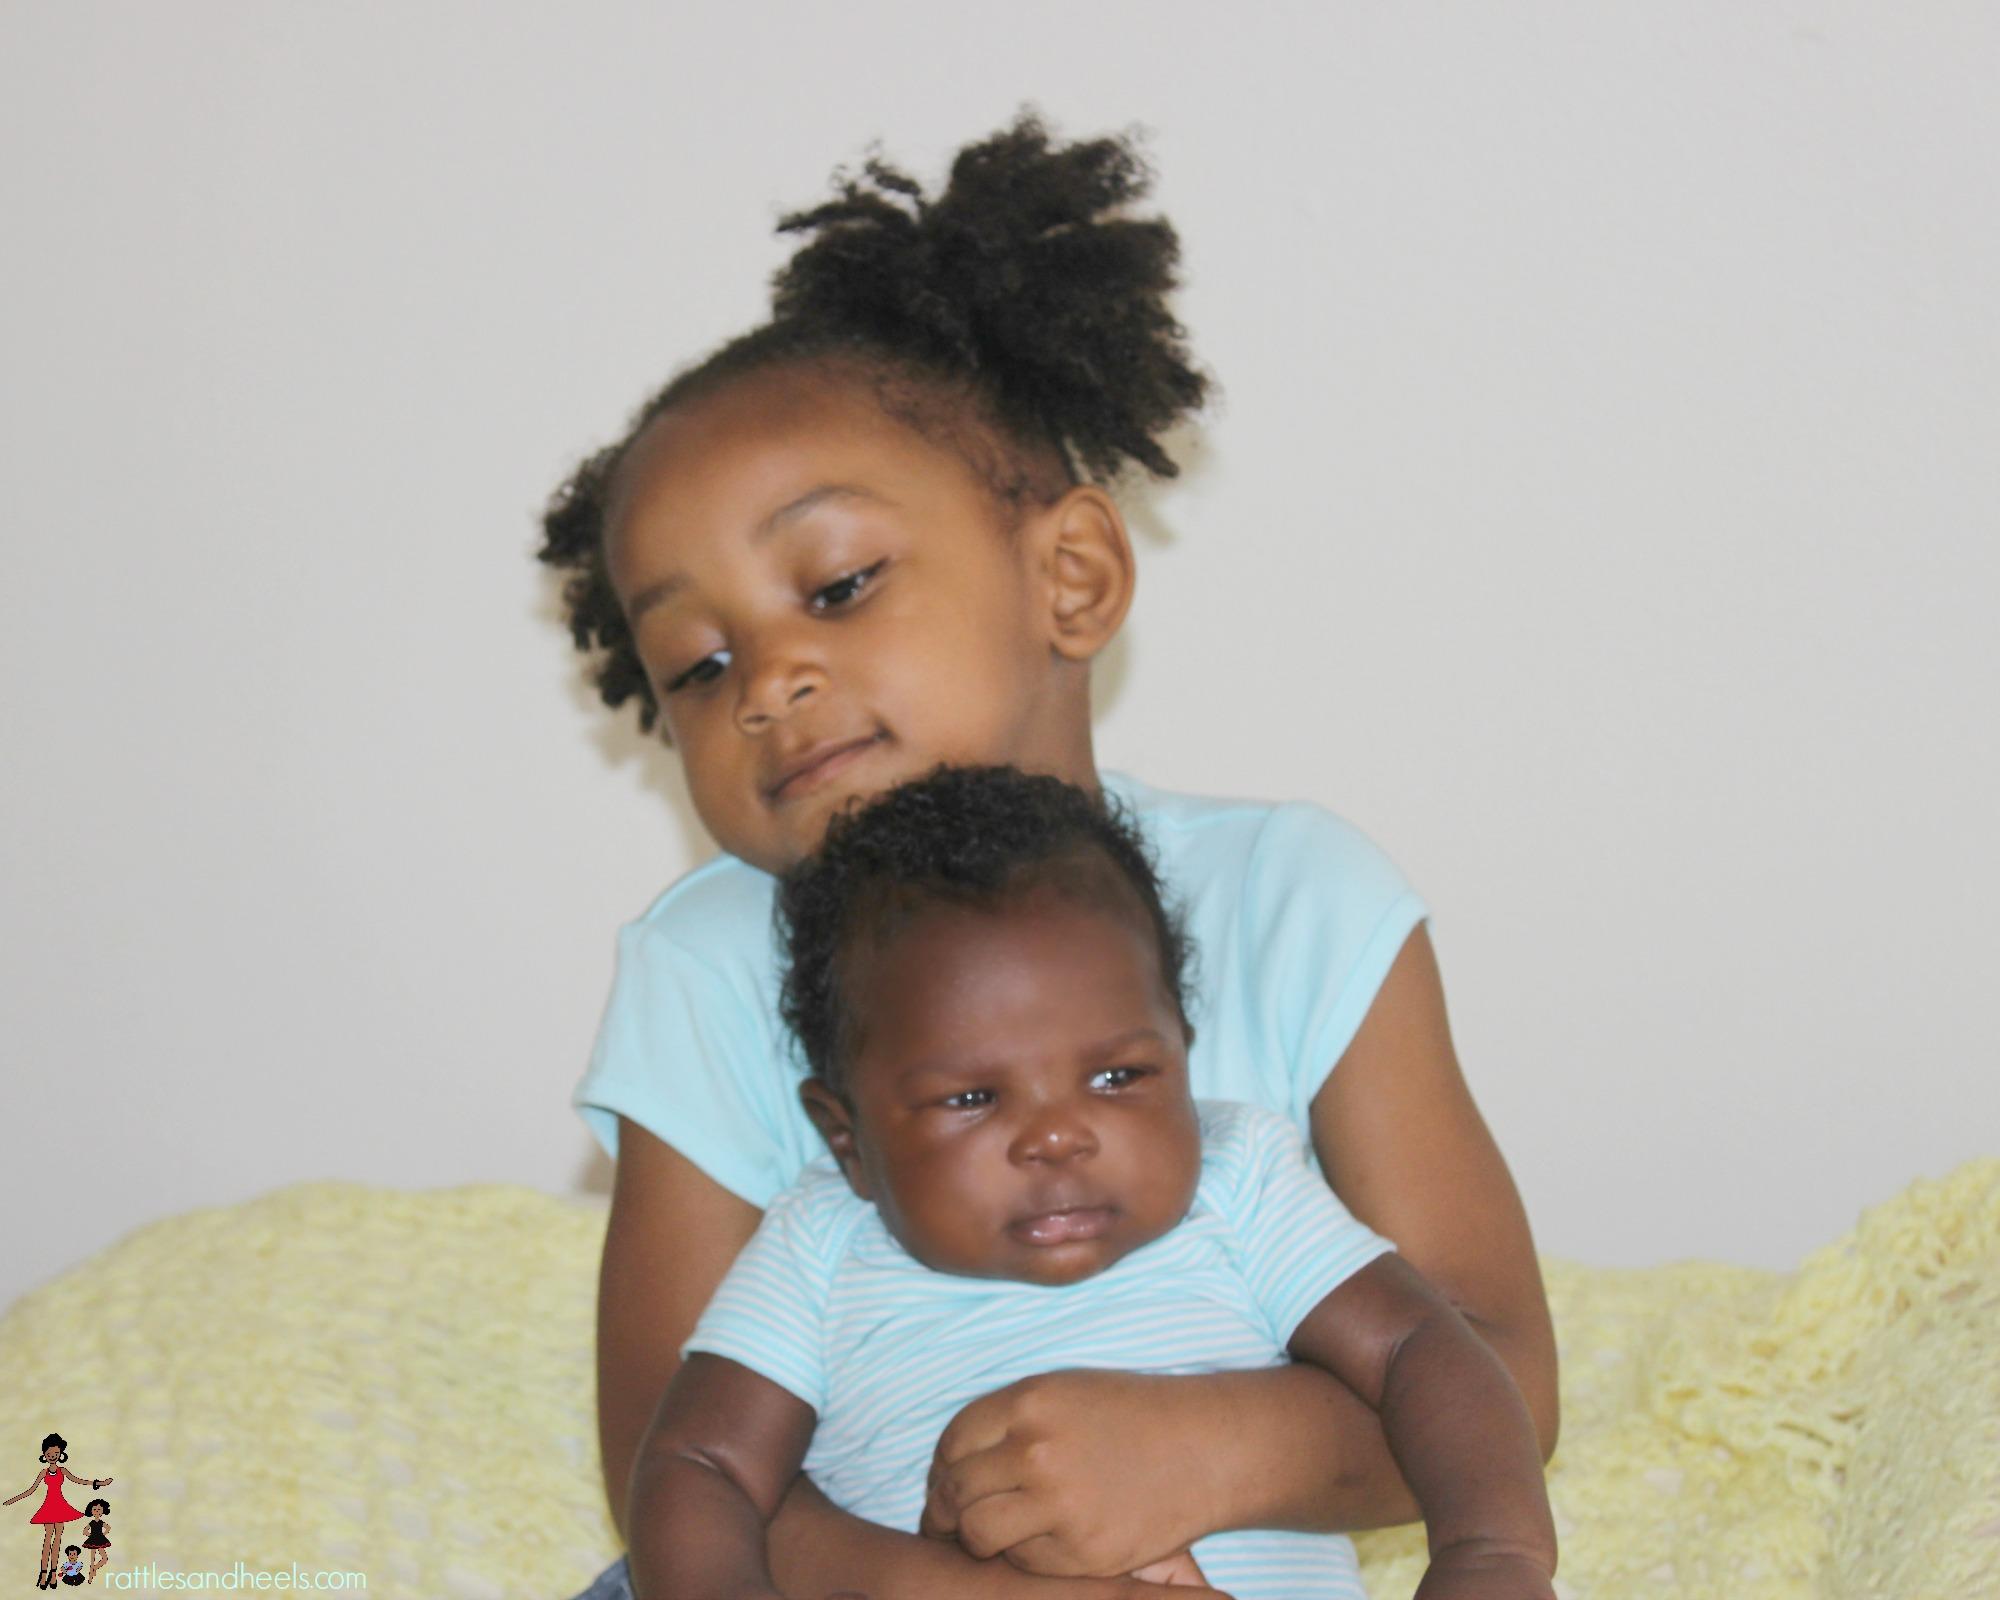 newborn-toddler-bonding